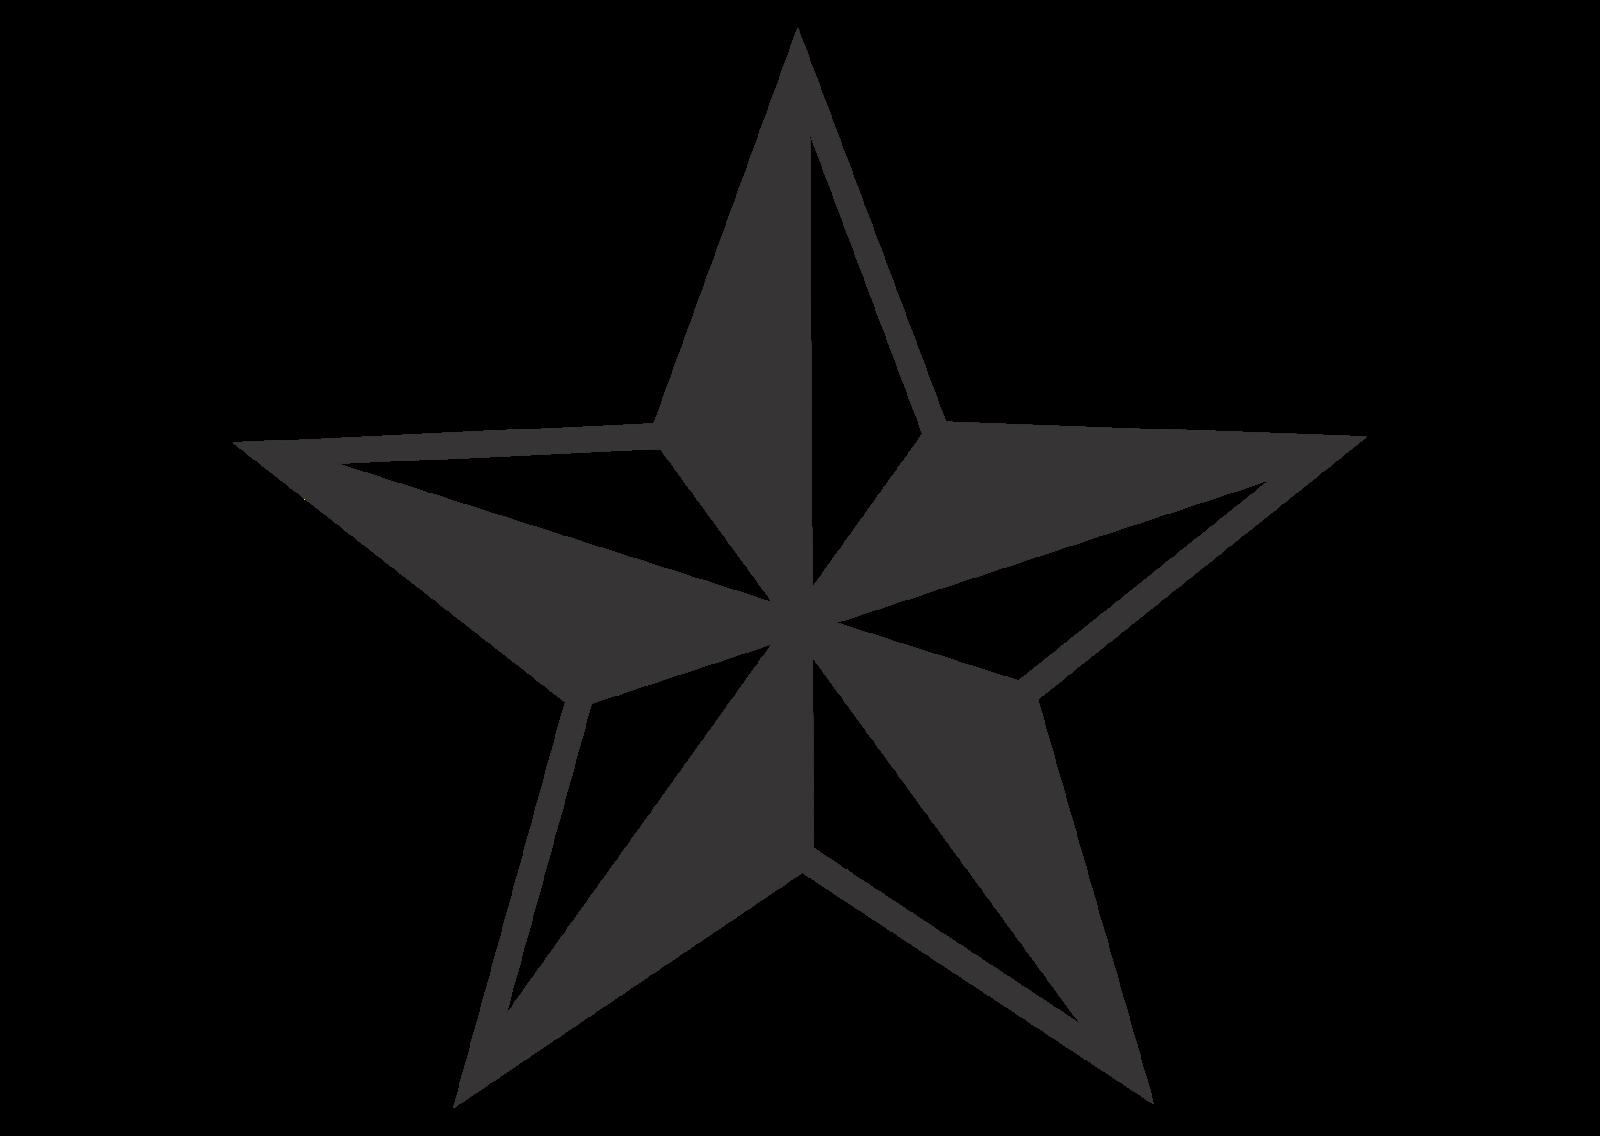 Nautical Star Logo Vector ~ Format Cdr, Ai, Eps, Svg, PDF, PNG